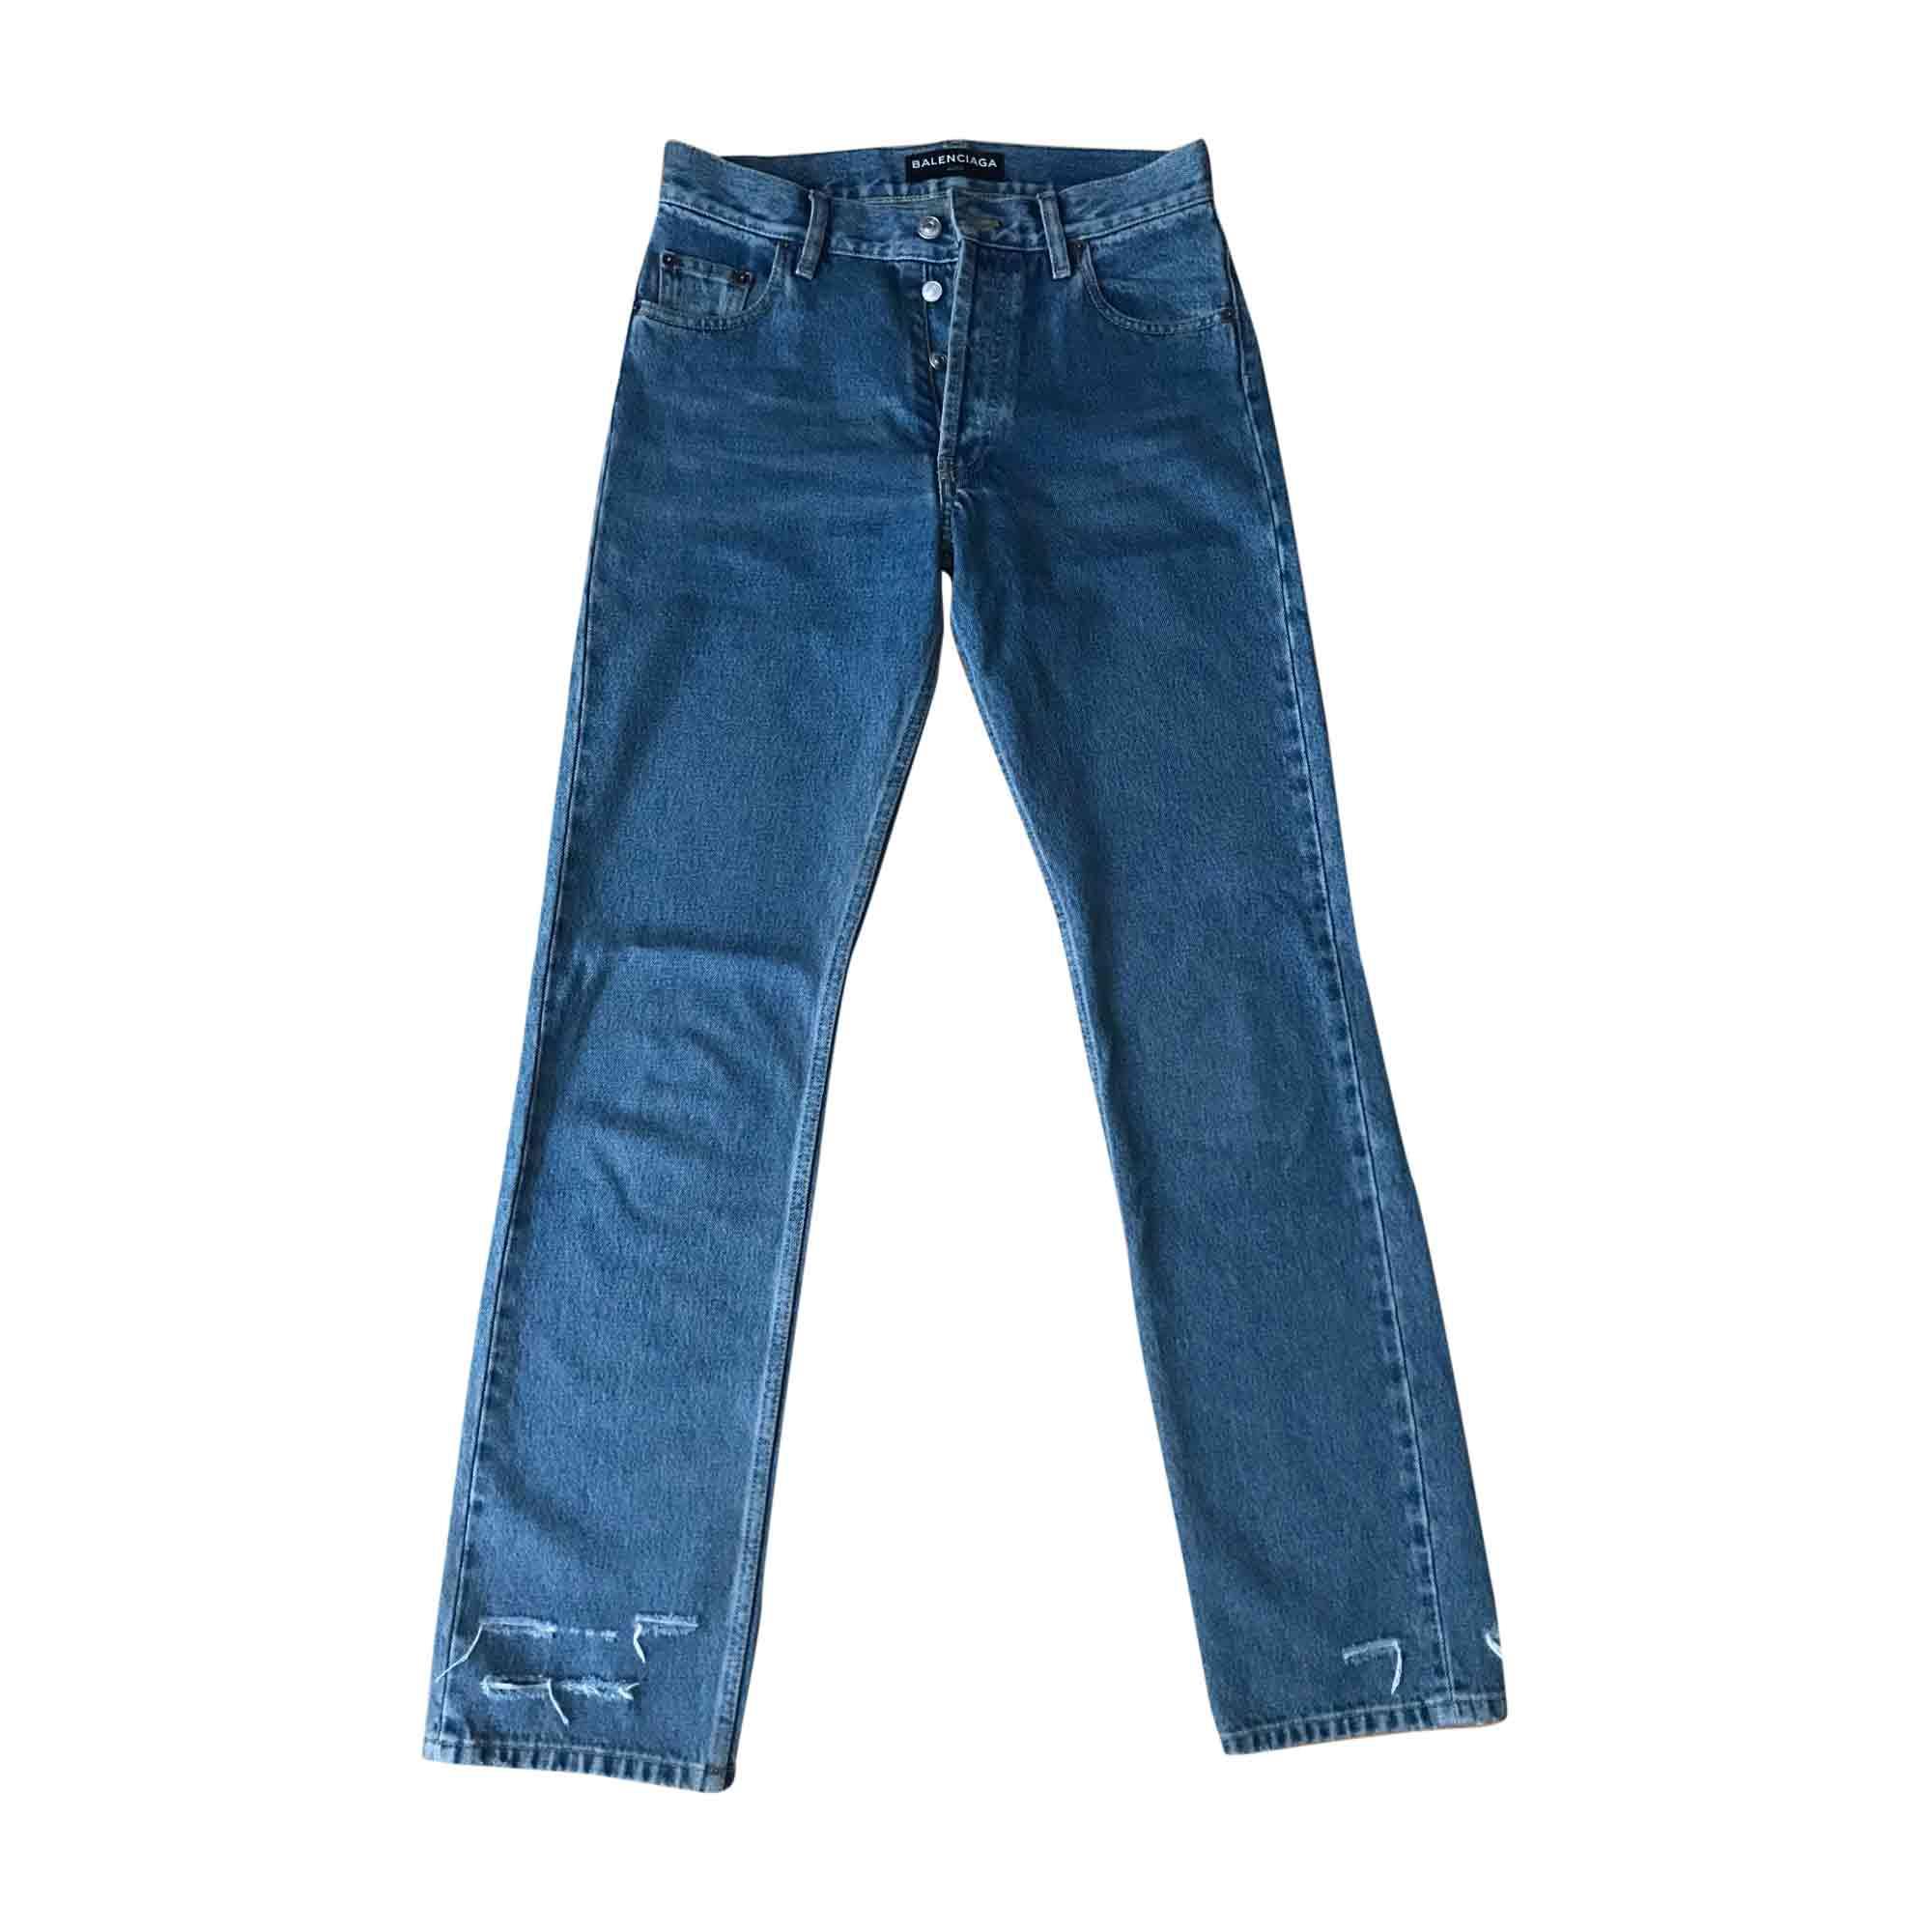 Jeans droit BALENCIAGA Bleu, bleu marine, bleu turquoise